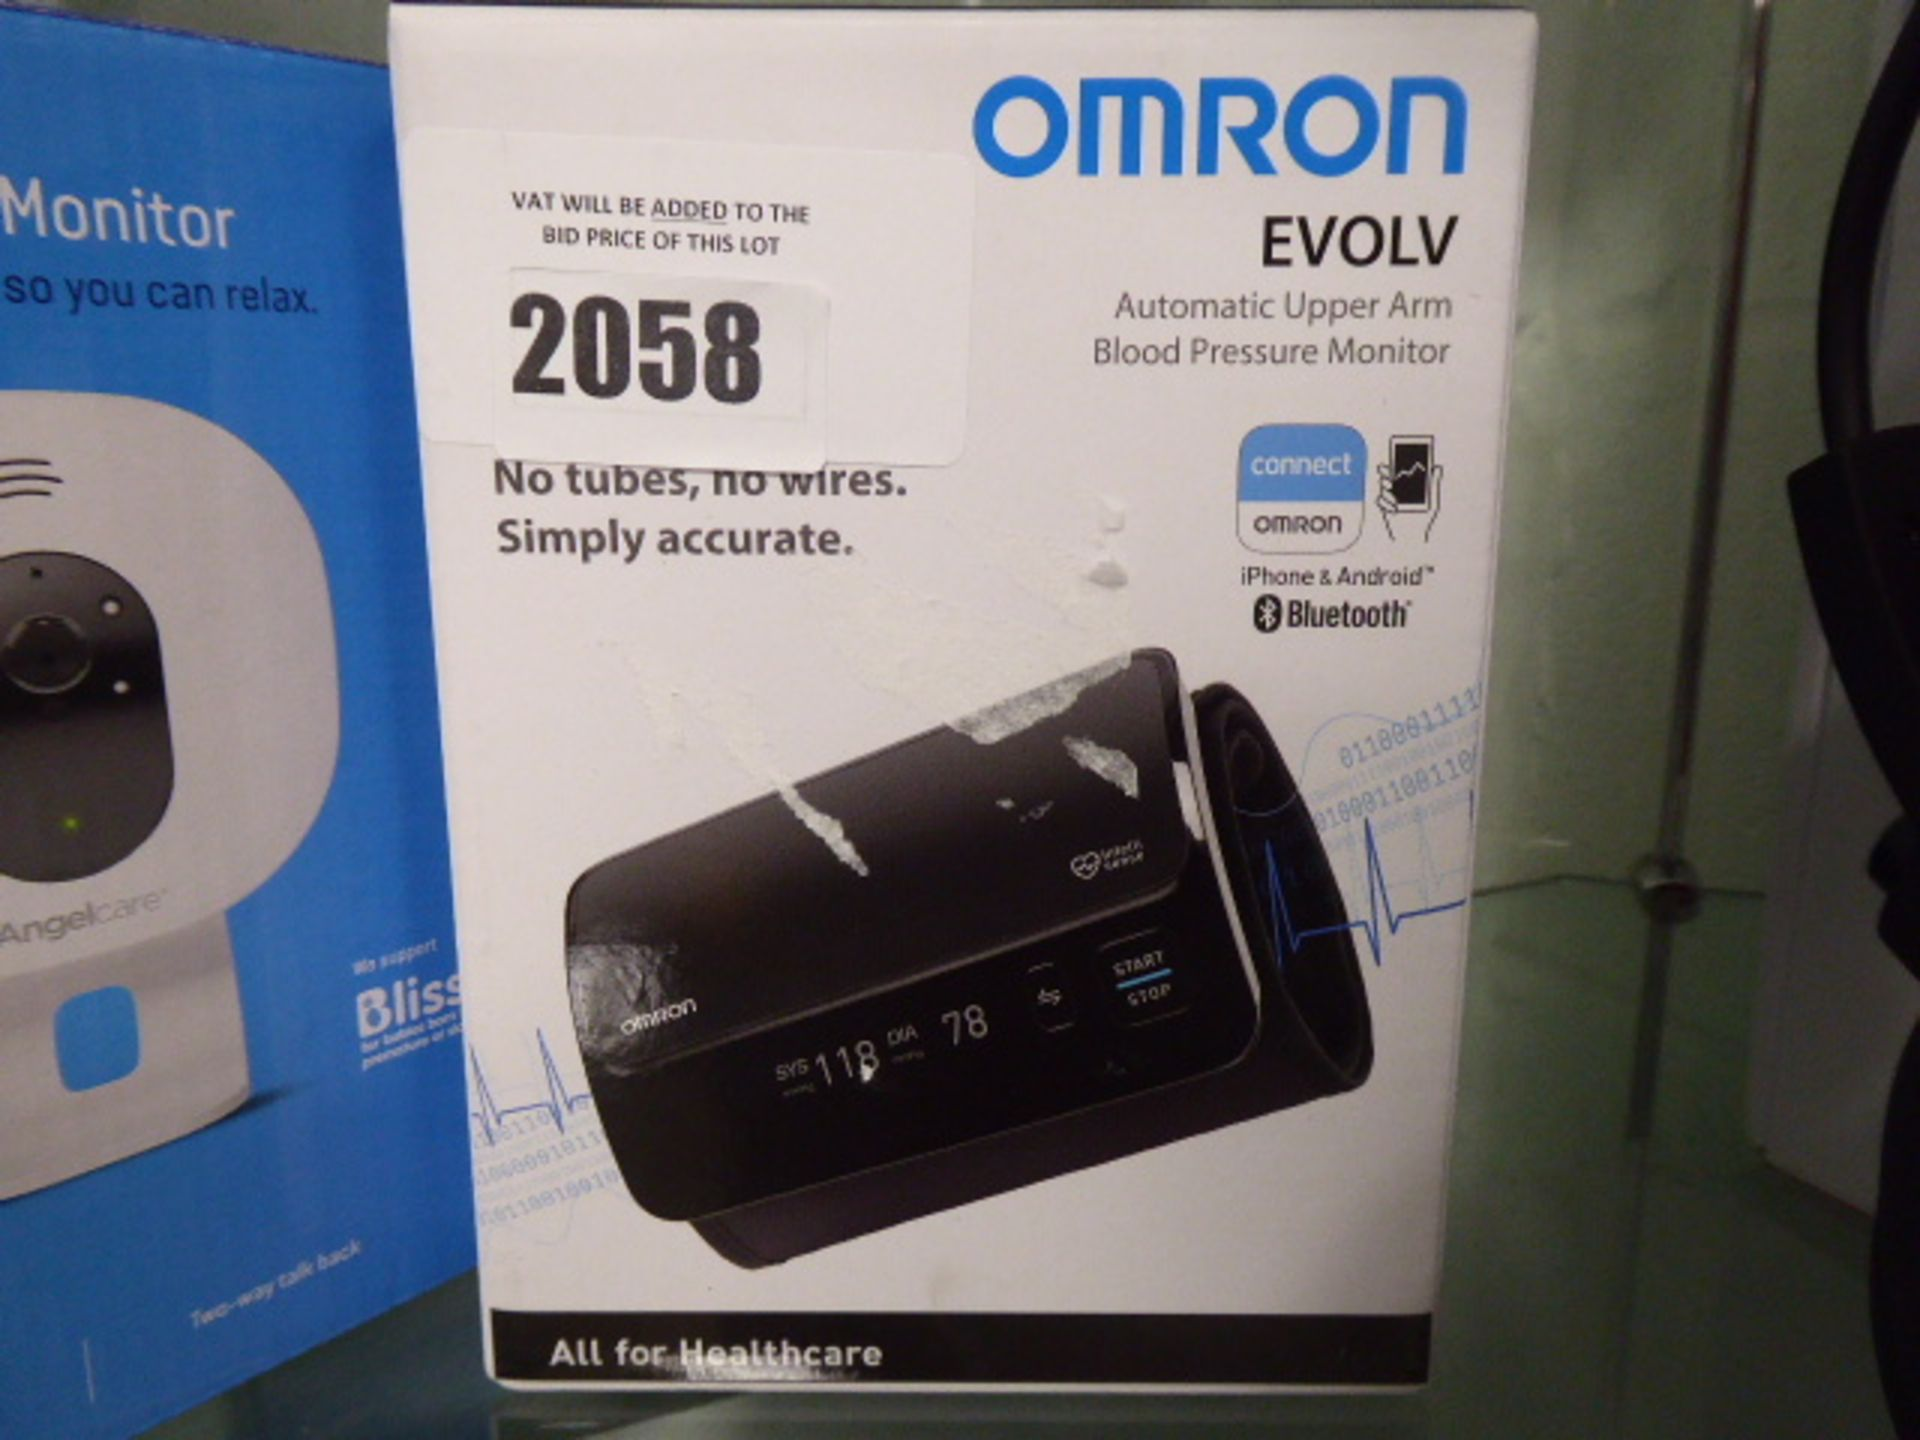 Omron Evolv automatic upper arm blood pressure monitor